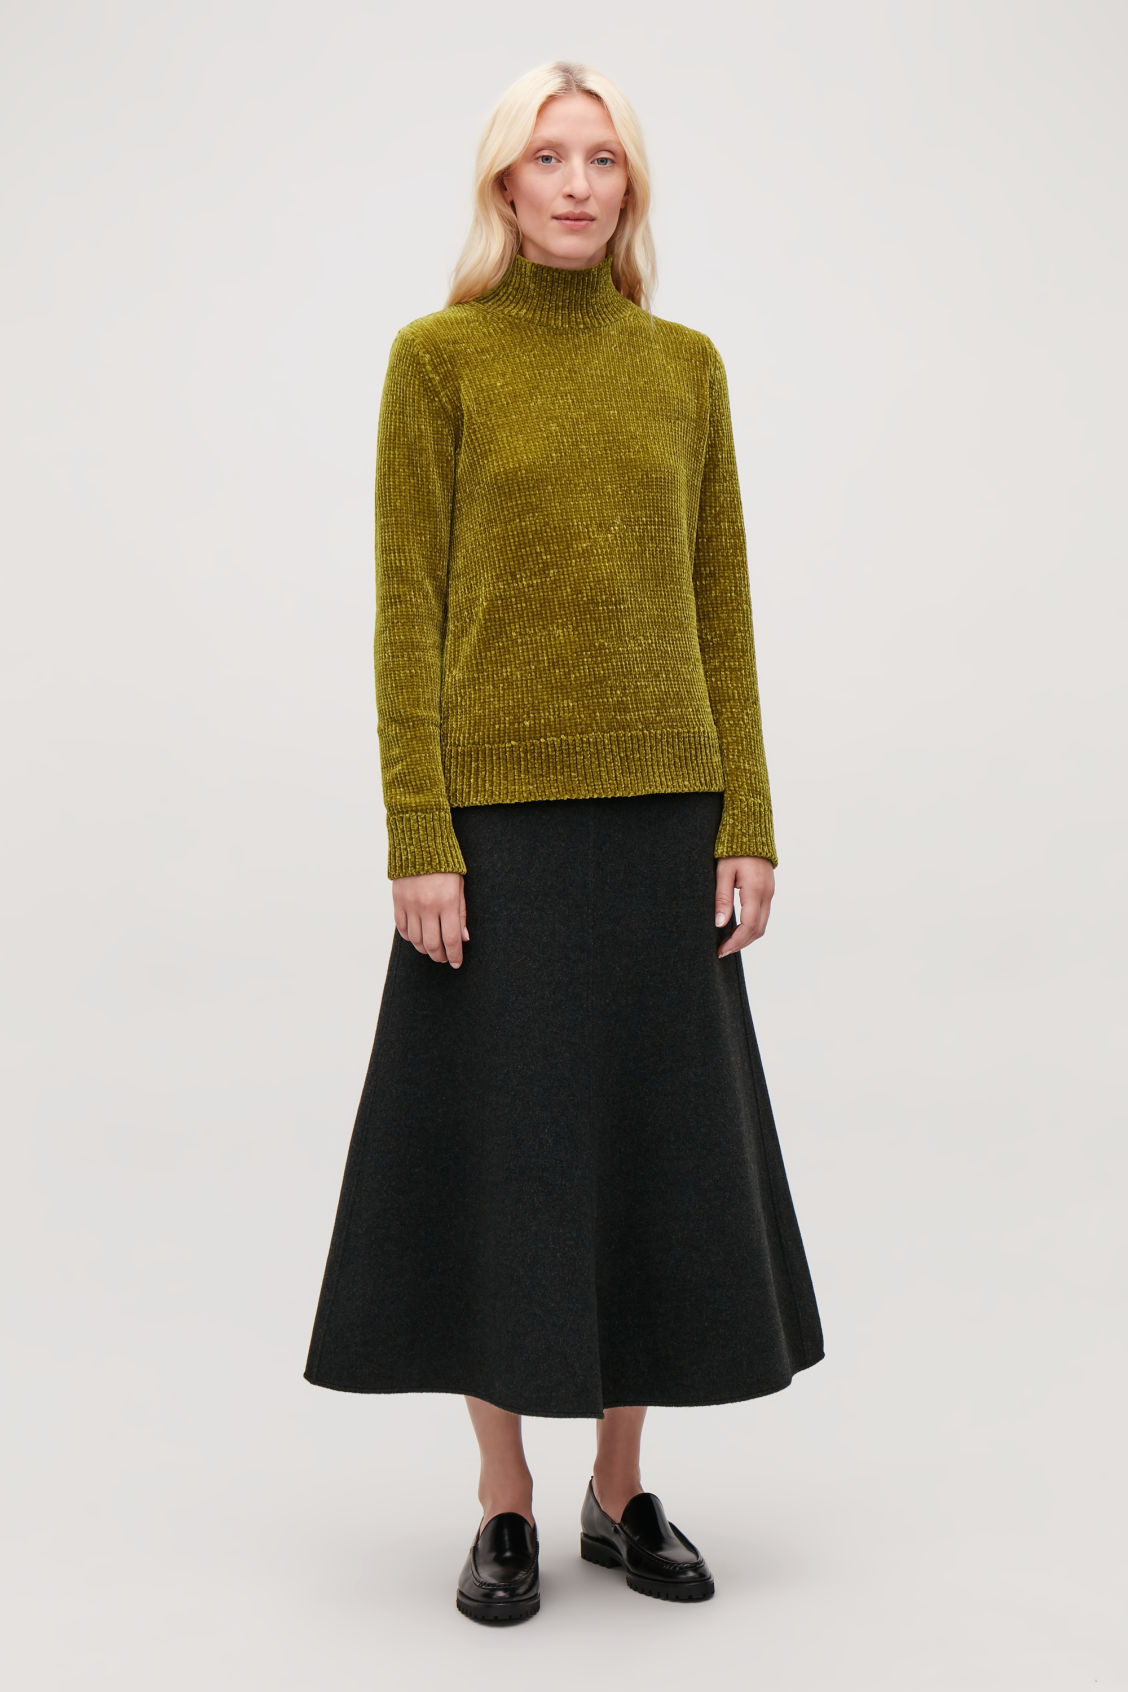 CHENILLE JUMPER WITH ZIP Dark mustard Knitwear COS